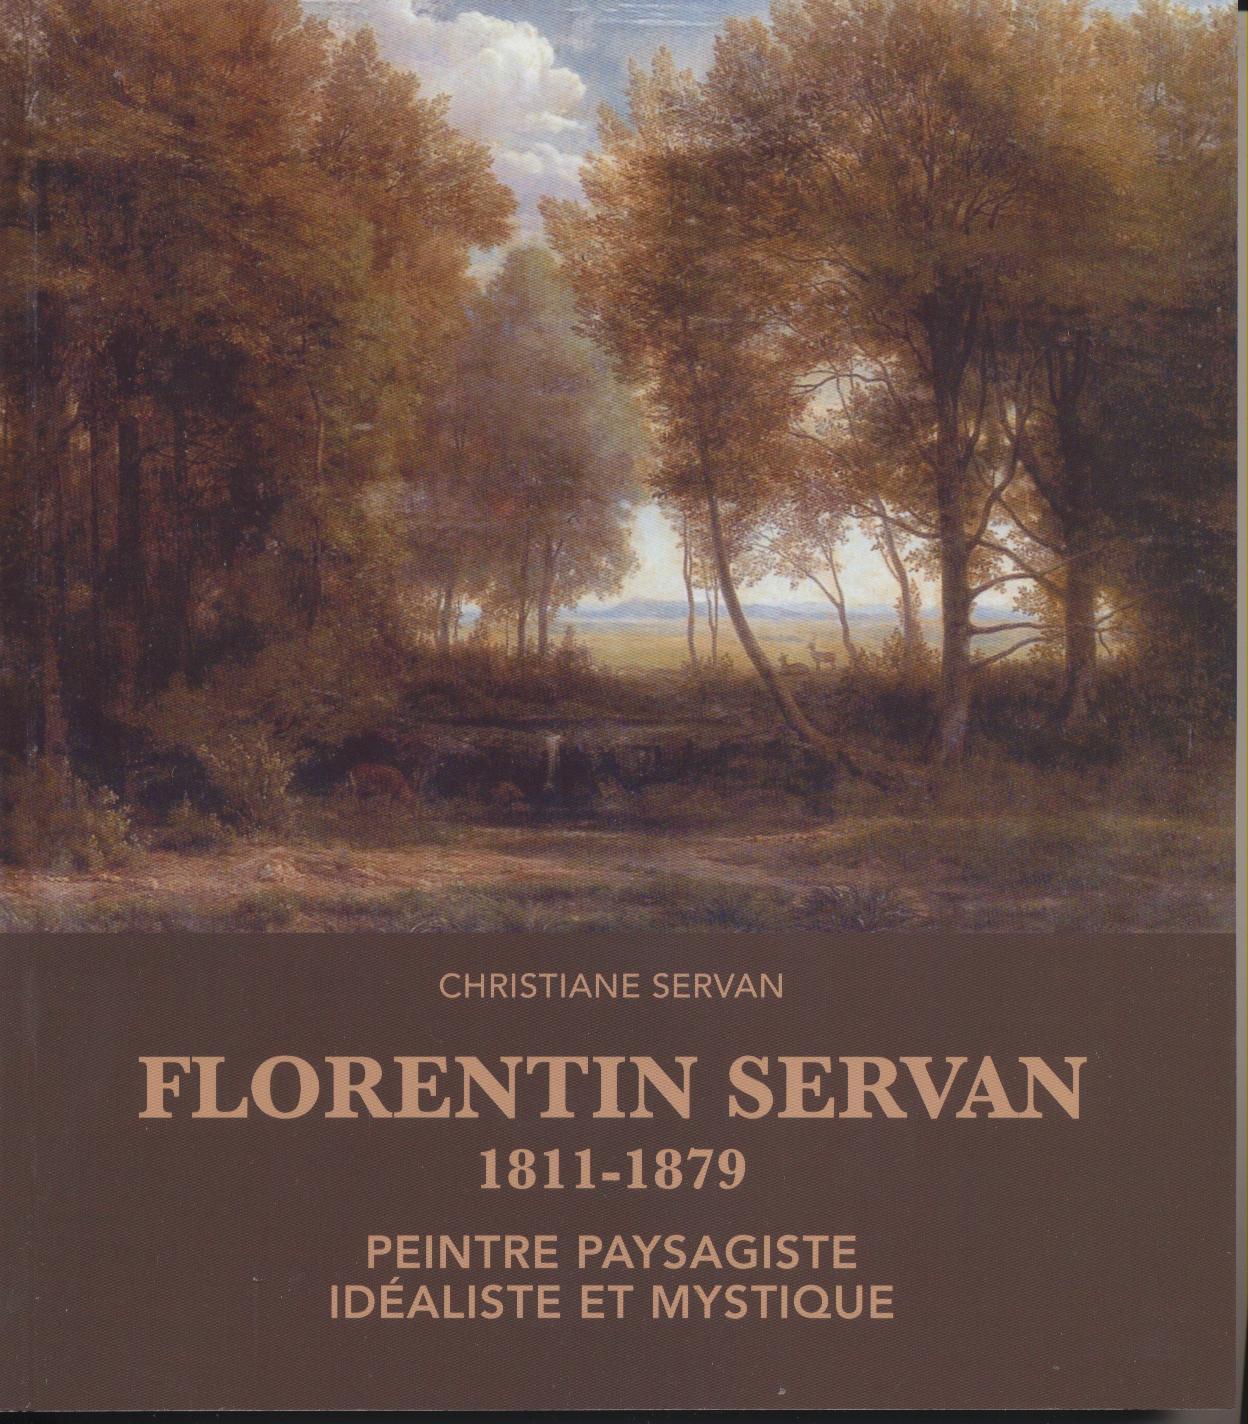 florentin servan 1811 1879 peintre paysagiste id aliste et mystique christiane servan atelier. Black Bedroom Furniture Sets. Home Design Ideas